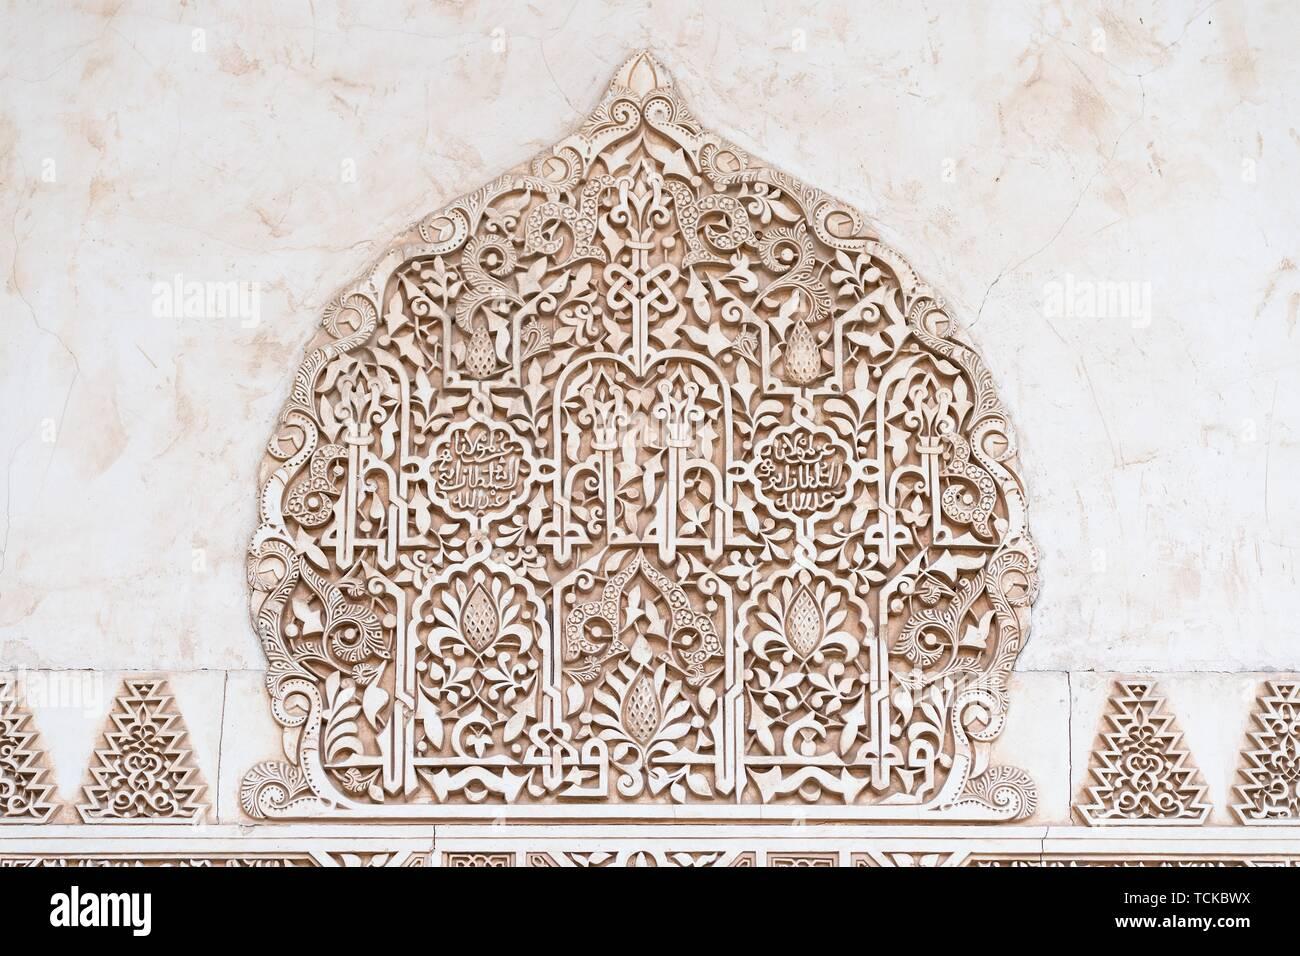 Ornamental Moorish plaster decorations, Nazarite palaces, Alhambra, Granada, Andalusia, Spain - Stock Image